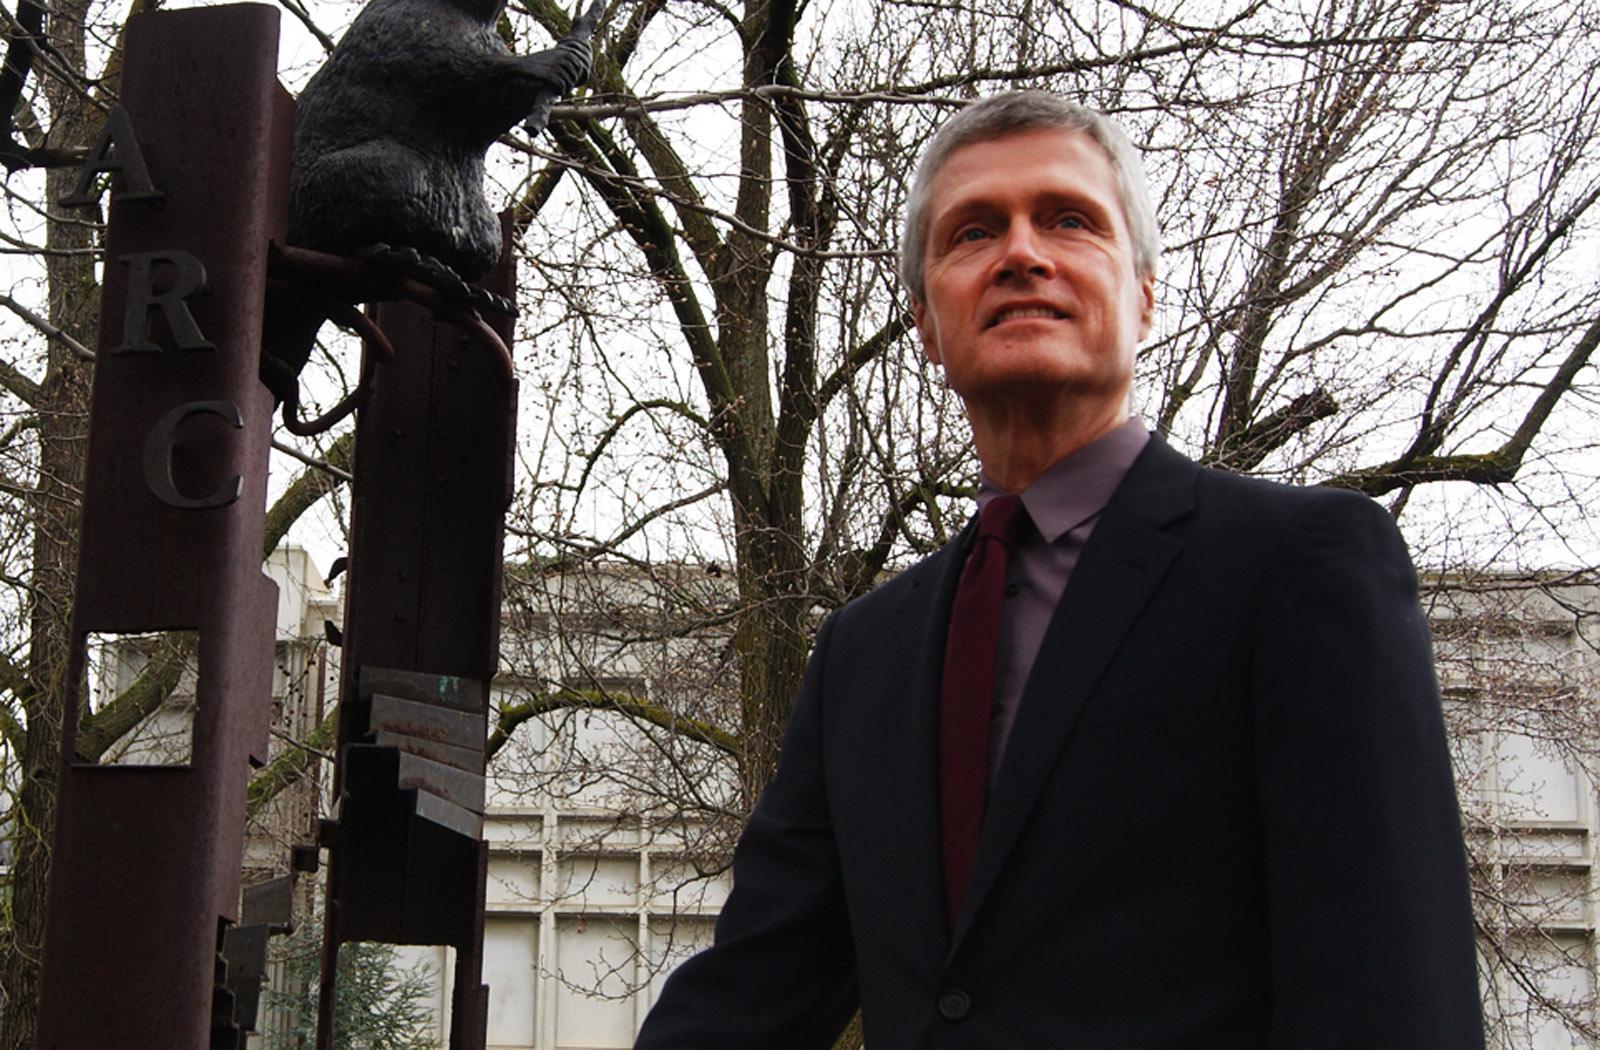 Dr. Viar, Viar, President, Beaver statue